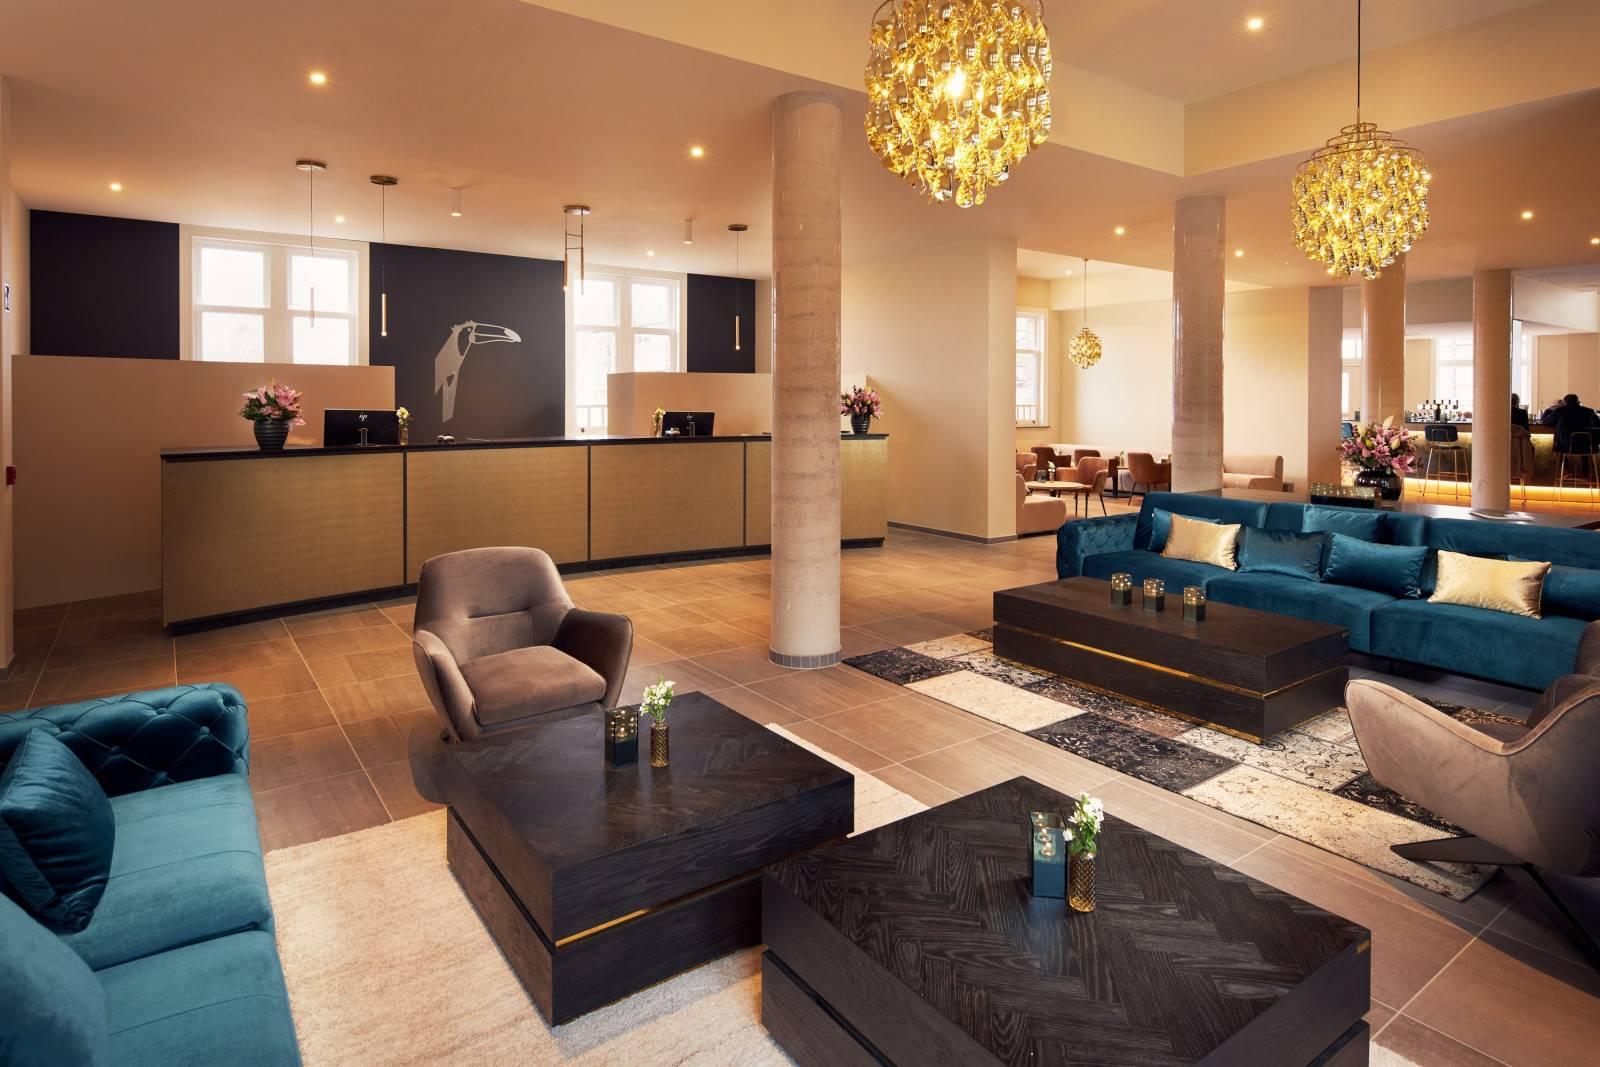 Feestal - Van der Valk hotel Mechelen - House of Weddings (5)